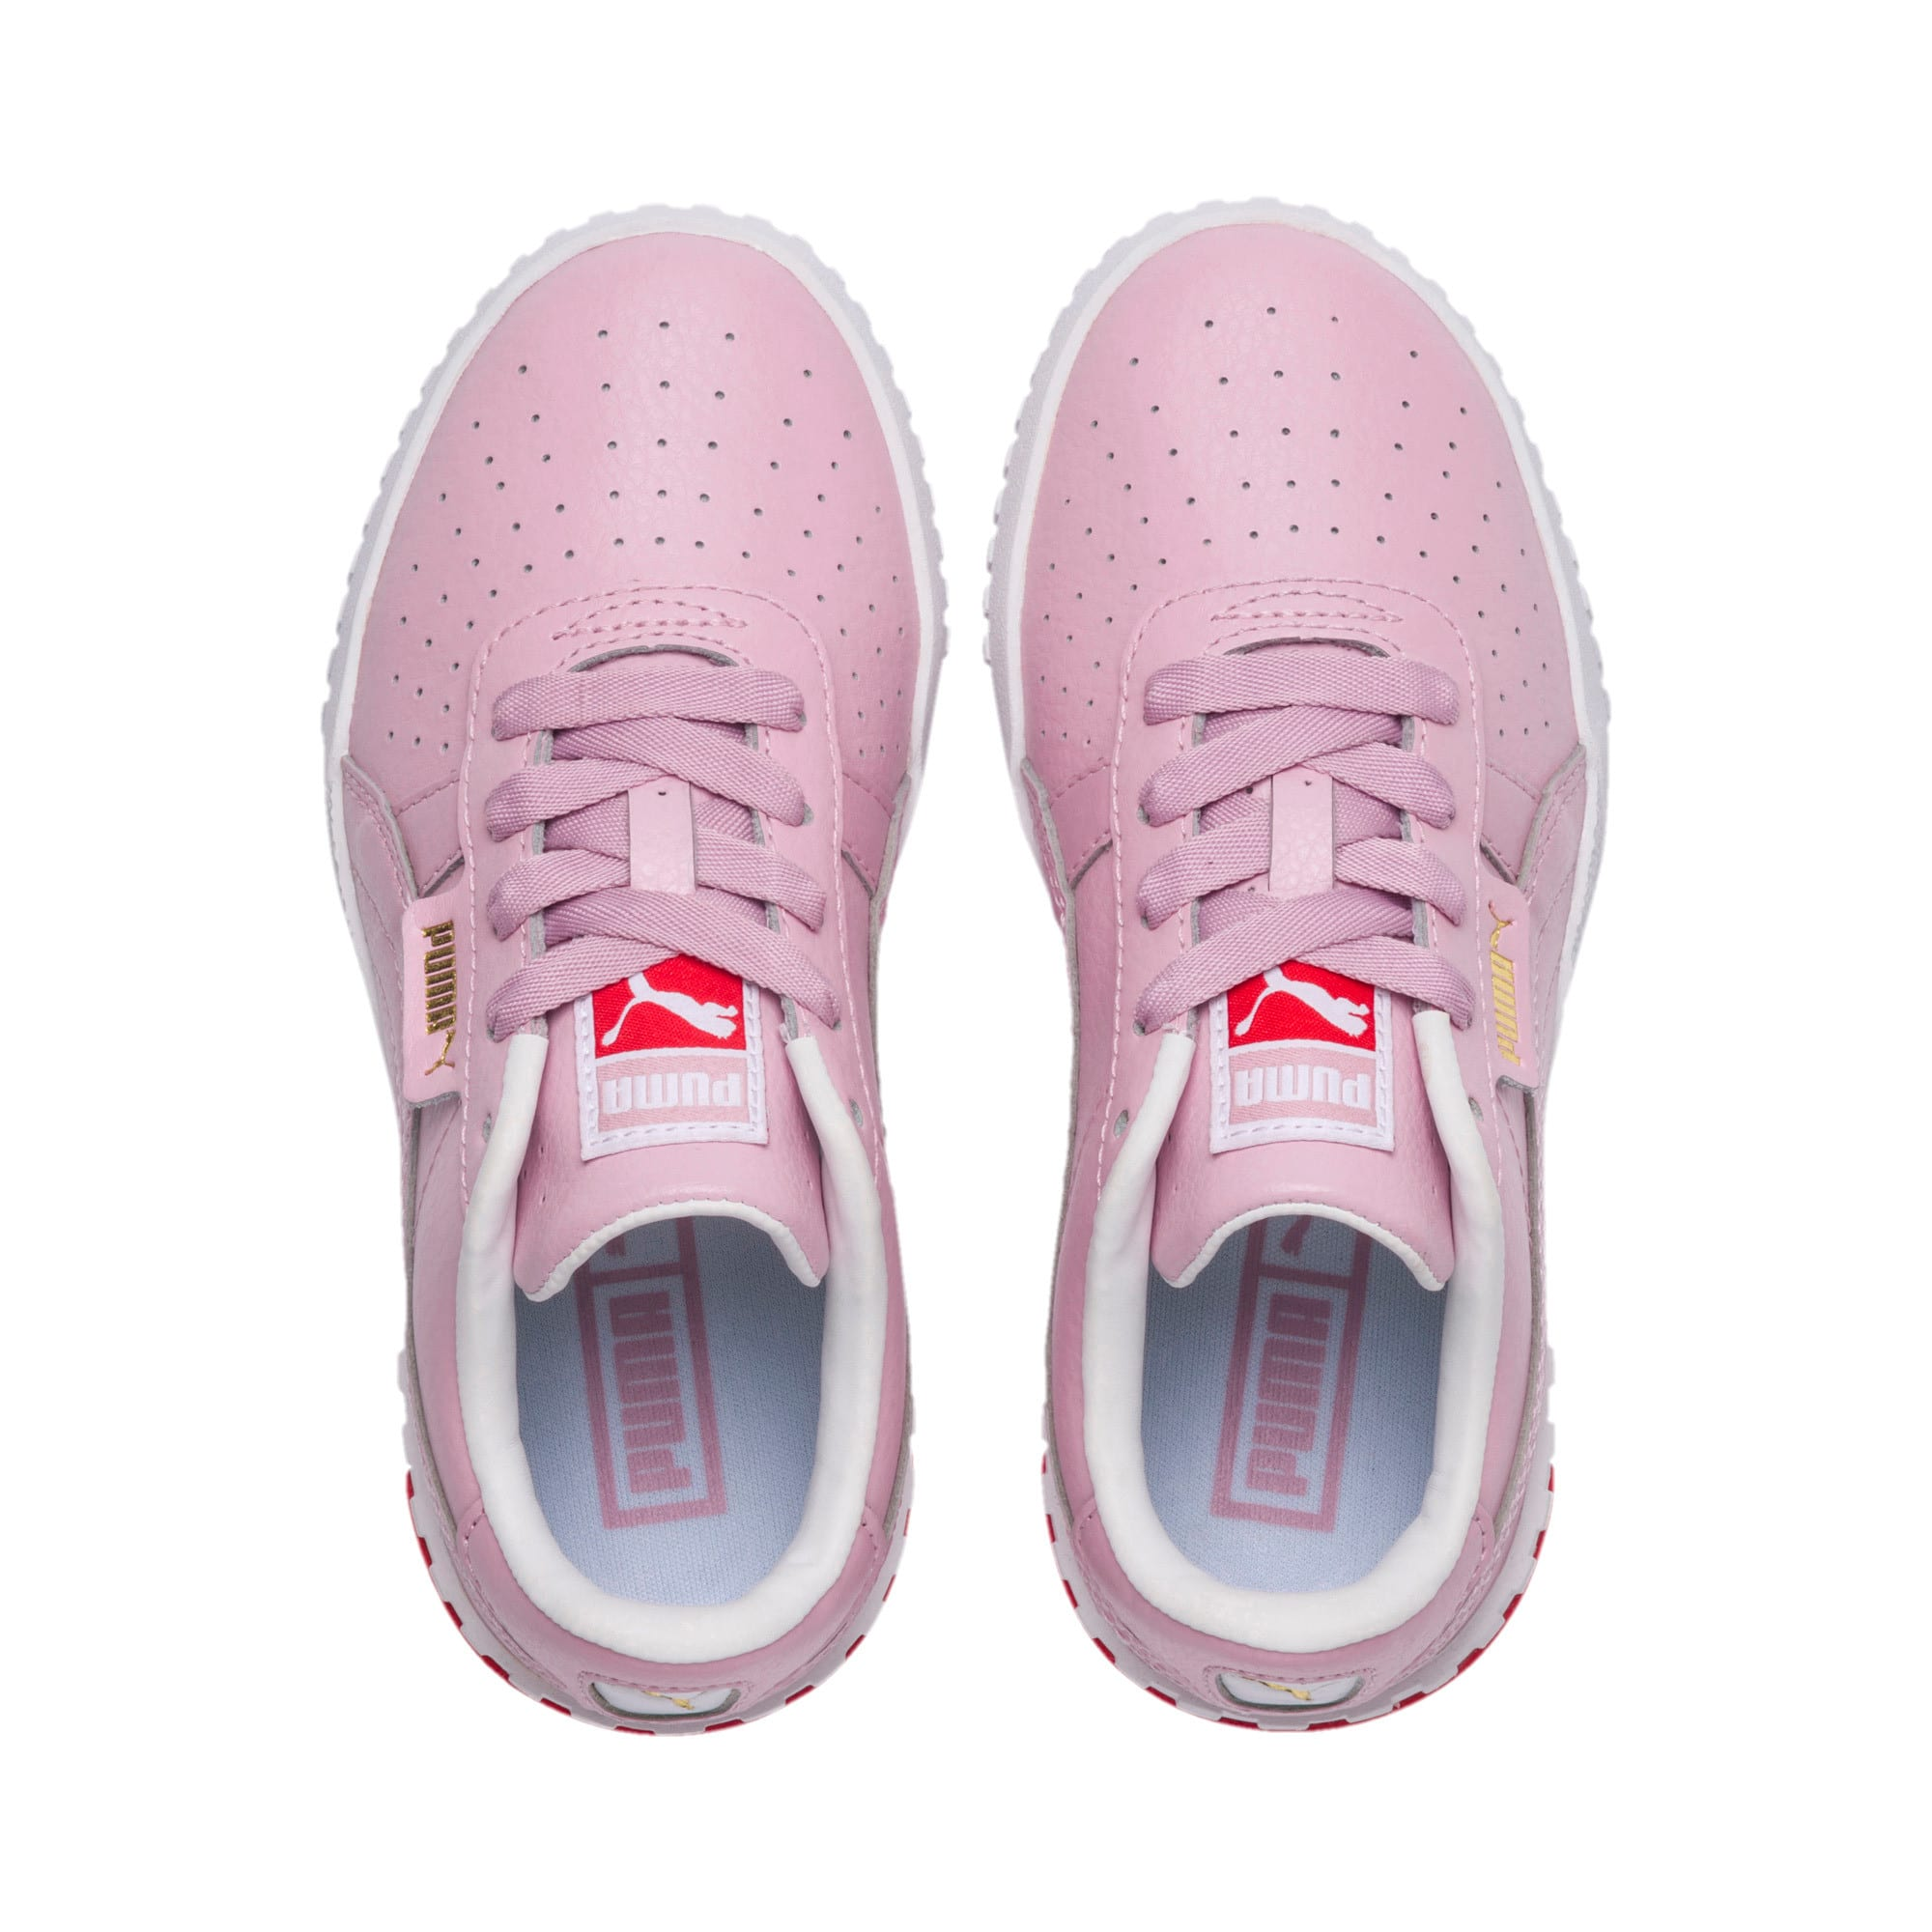 Thumbnail 6 of Cali sneakers voor meisjes, Puma White-Hibiscus, medium